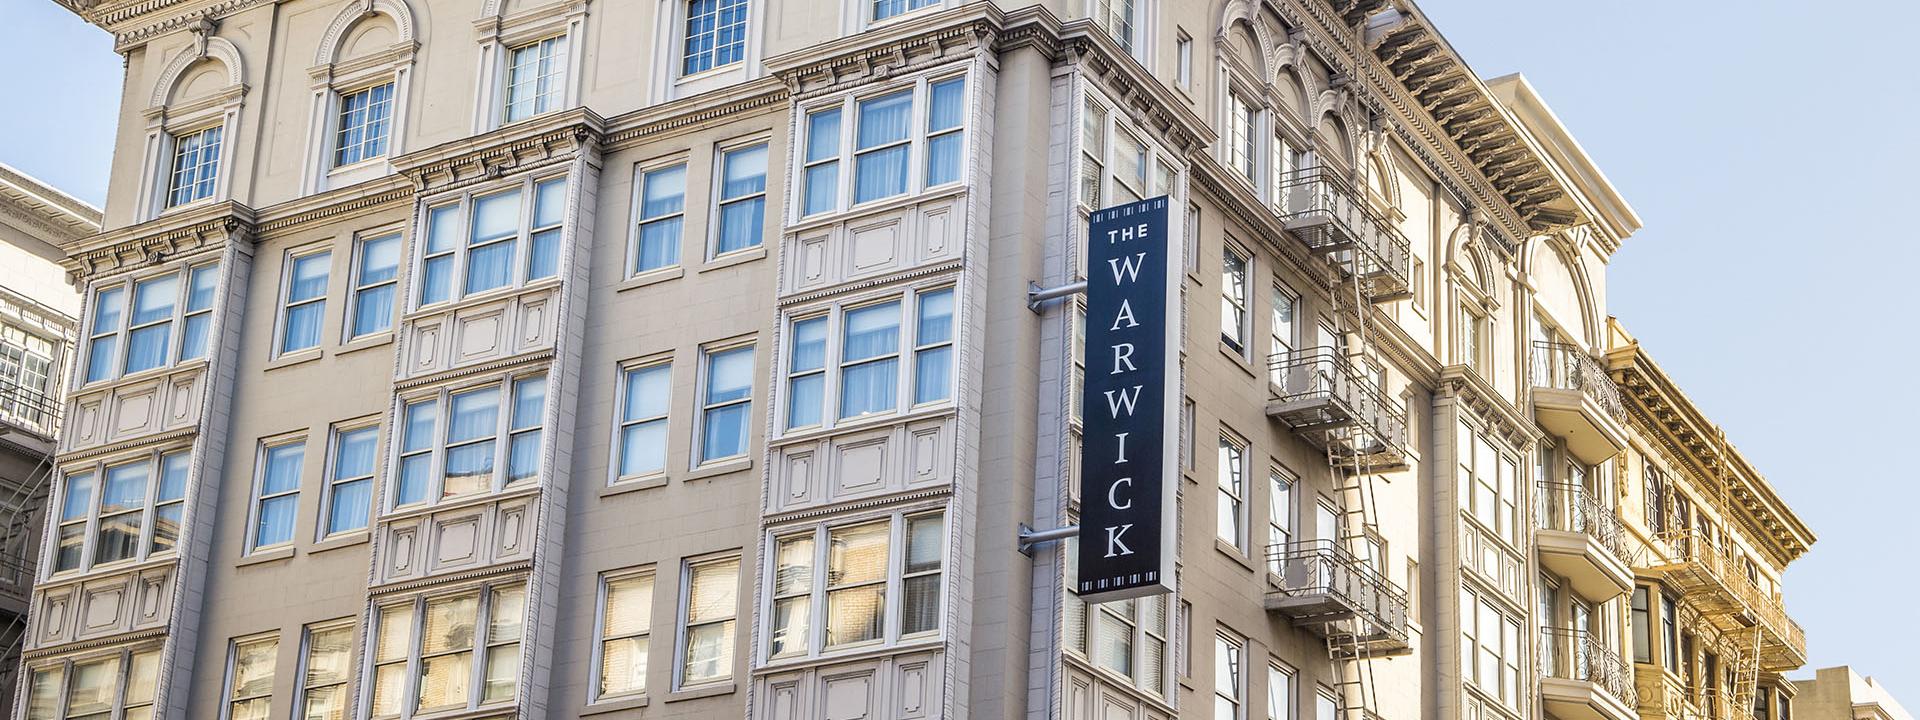 Warwick San Francisco Hotel Facade